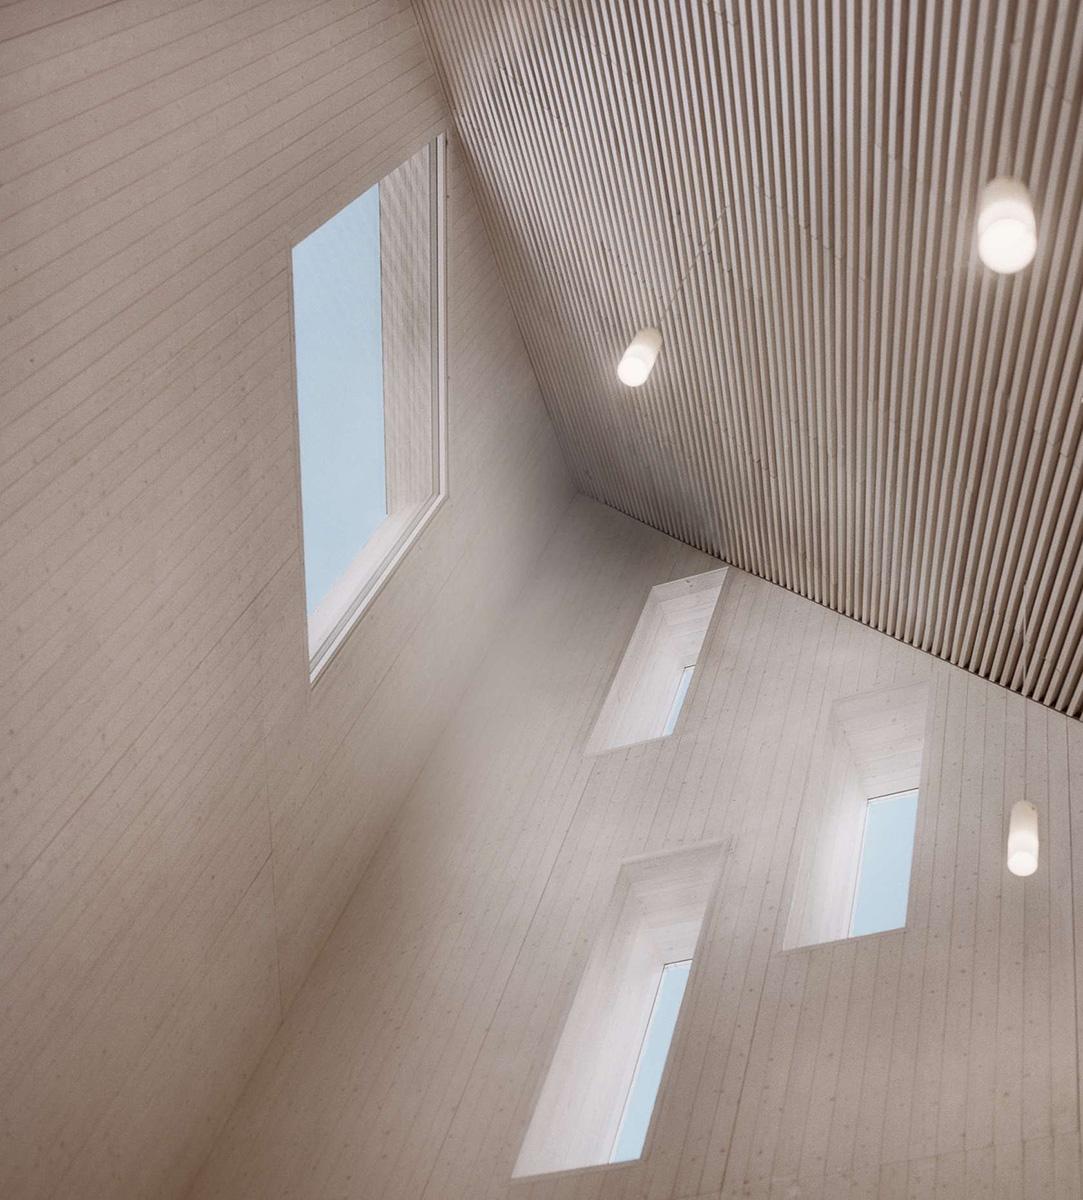 06-romsdal-folk-museum-reiulf-ramstad-architects